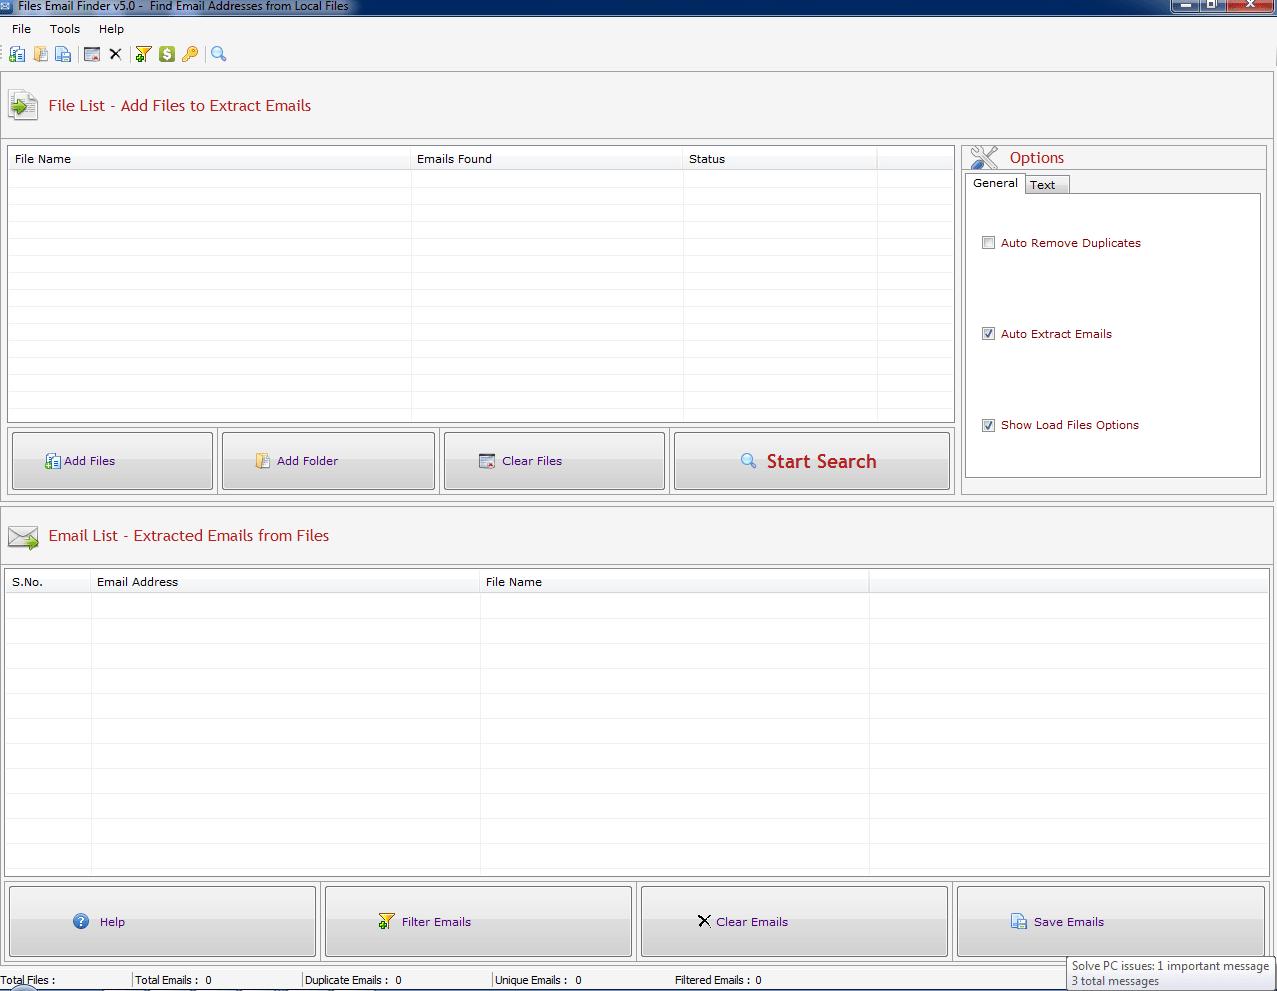 Files Email Finder